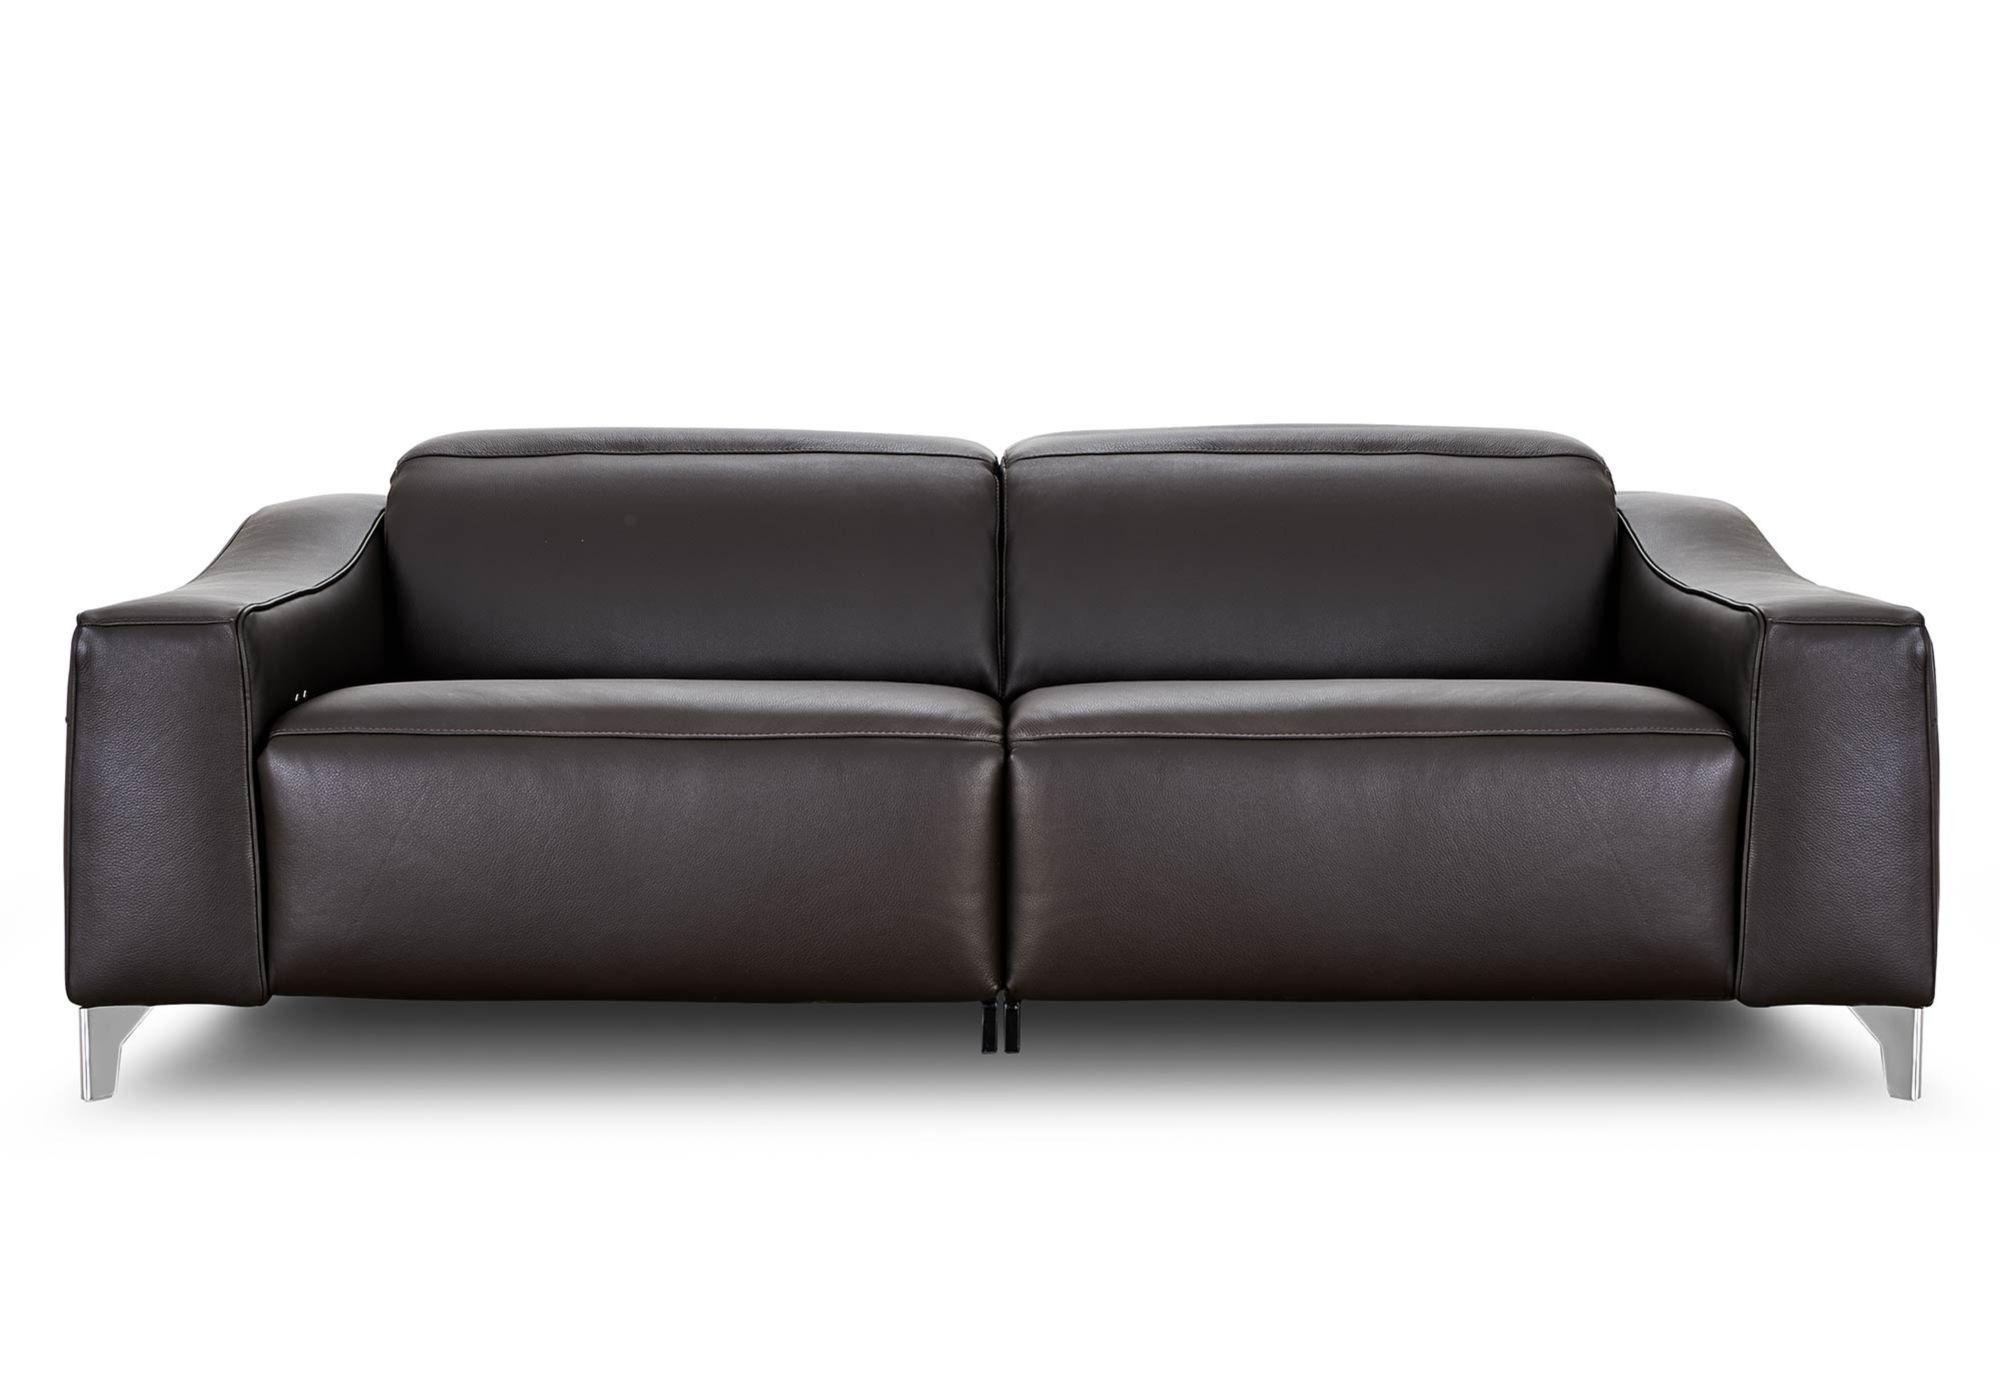 italian leather furniture stores. 3 Seater Italian Leather Sofa From Natuzzi Private Label. Furniture Stores O